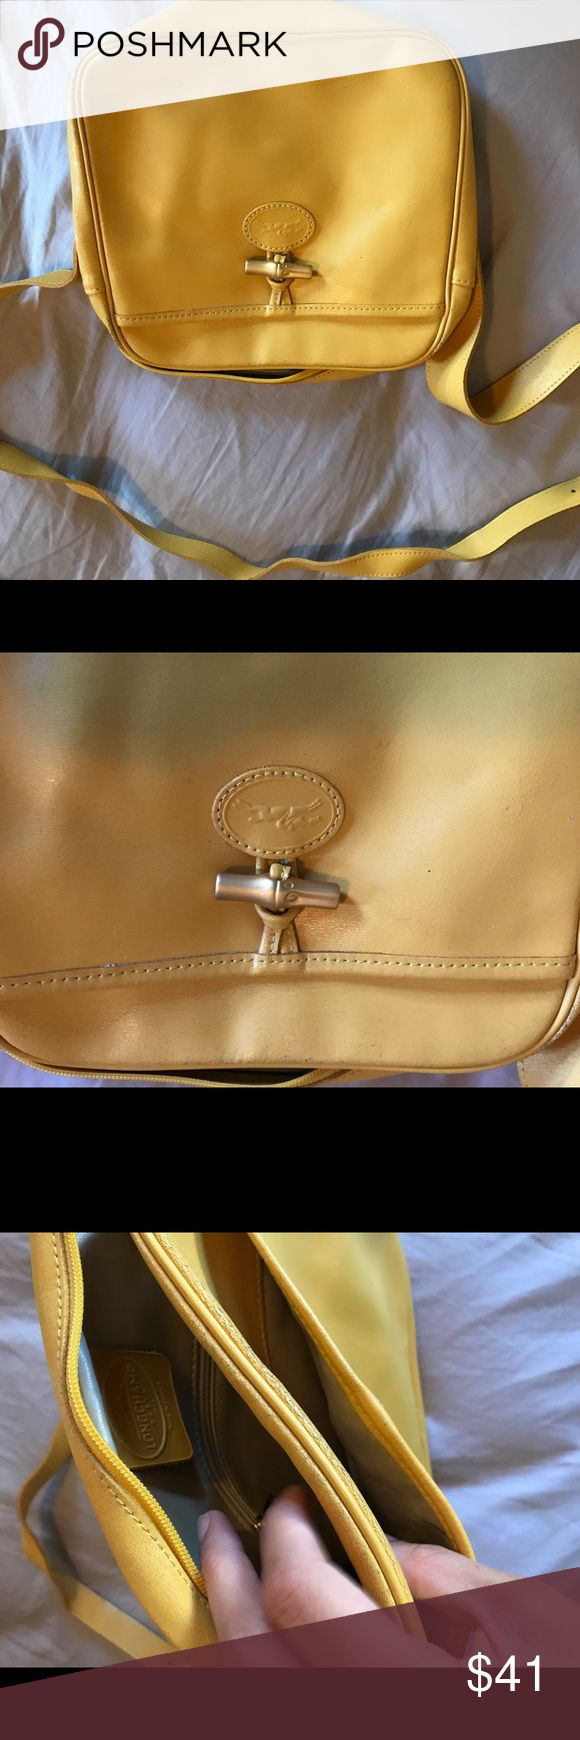 The 927 Best Designer Handbags Images On Pinterest Couture Bags Longchamp Le Pliage Cocarde Crossbody Navy Longchamp29